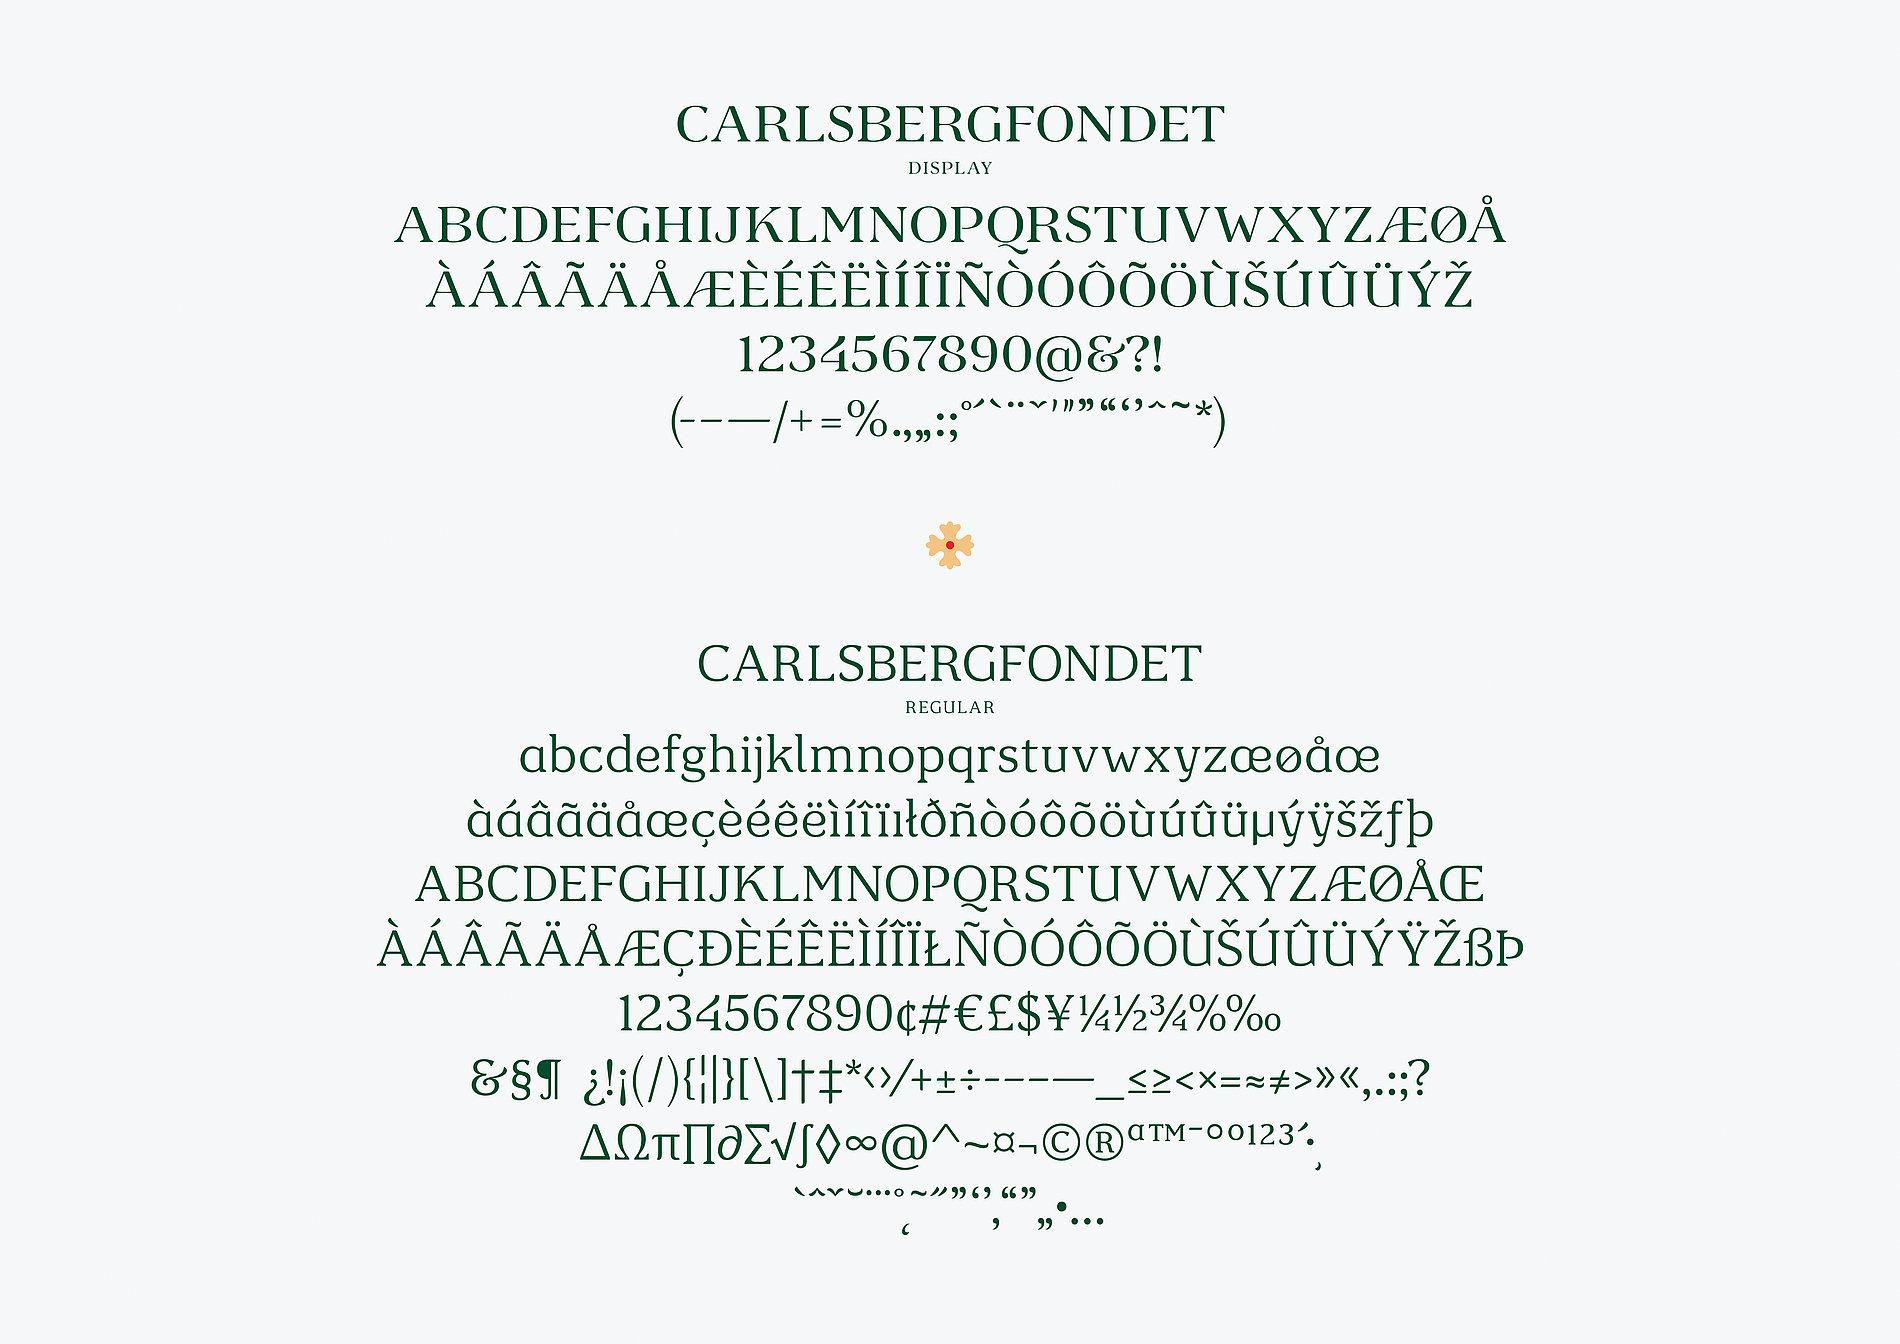 Carlsbergfondet Carlsberg Foundation | Red Dot Design Award